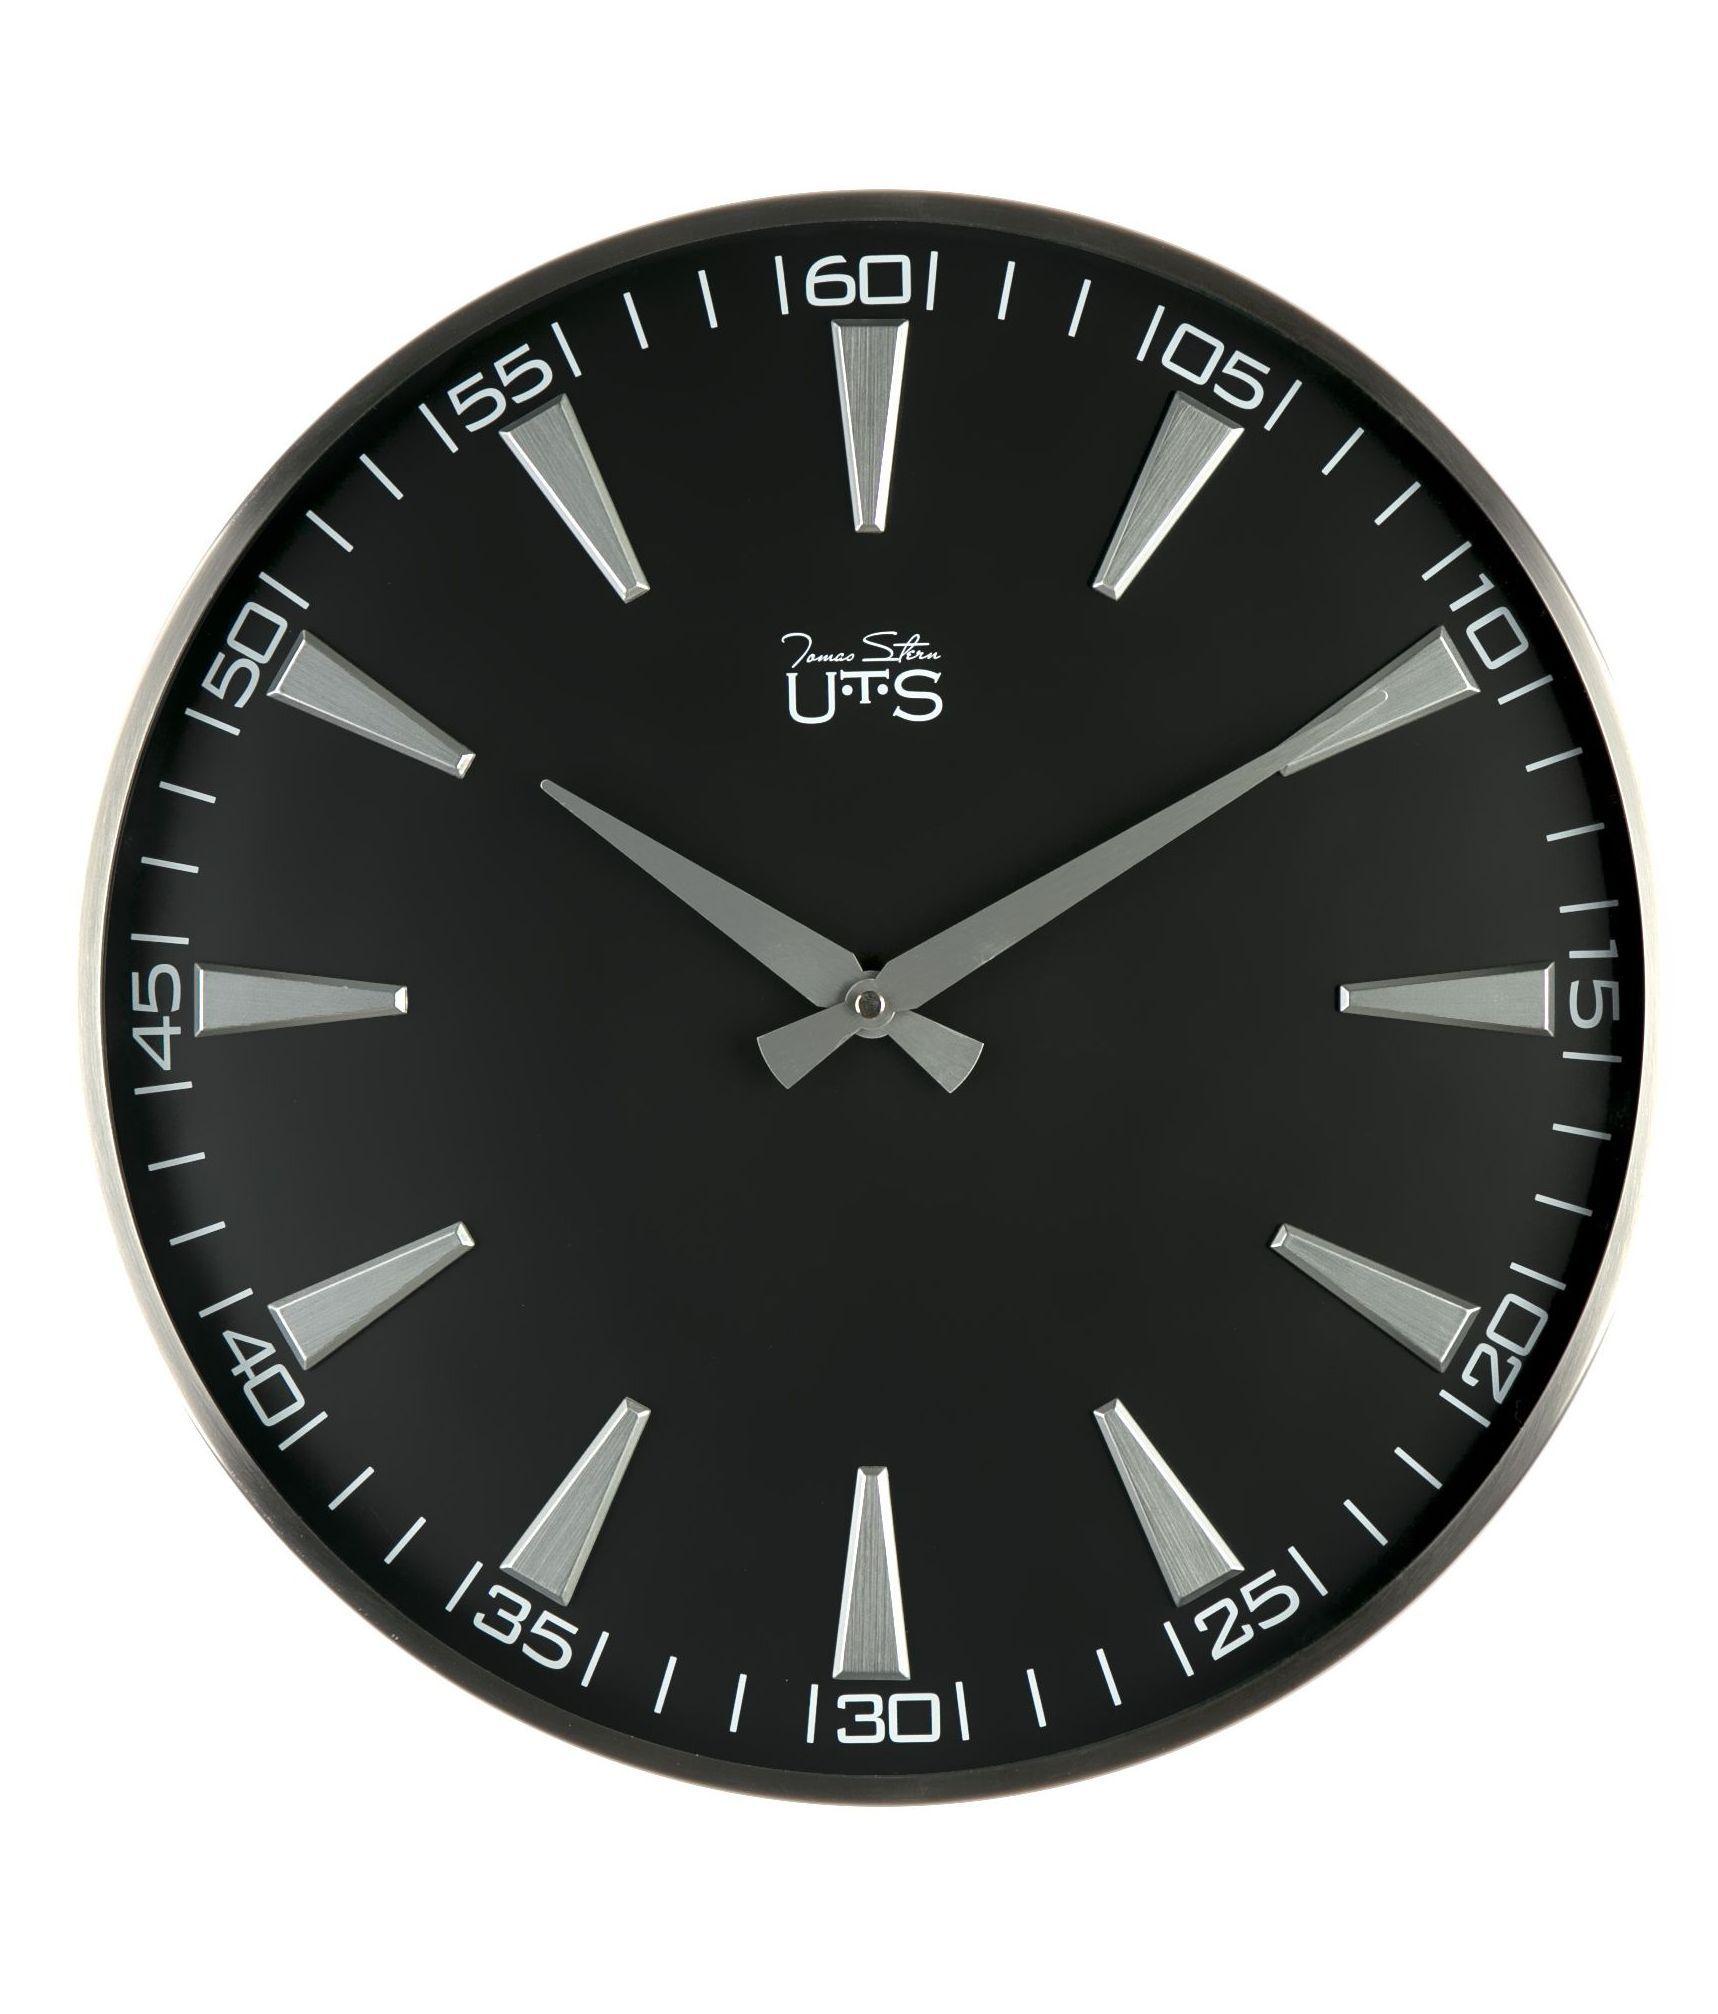 Часы настенные Часы настенные Tomas Stern 9011 chasy-nastennye-tomas-stern-9011-germaniya.jpg